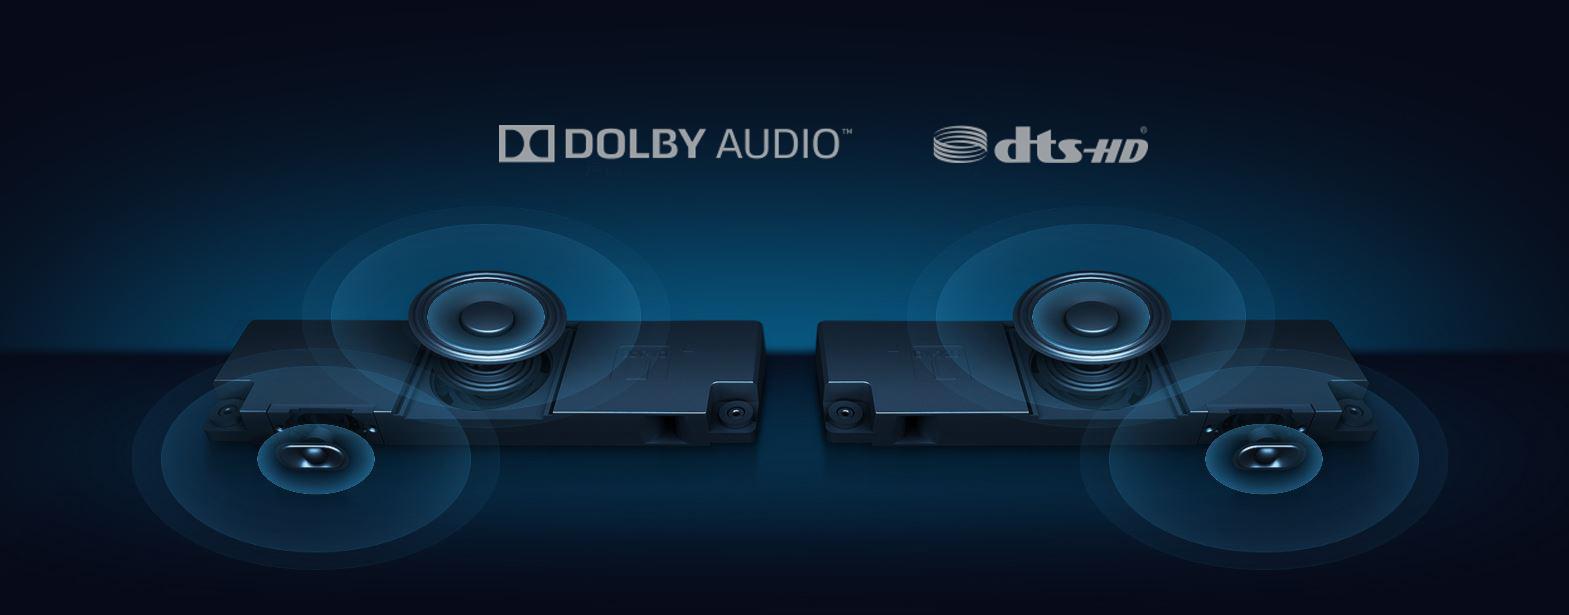 Xiaomi Mi TV 5 Pro Dolby Audio DTS